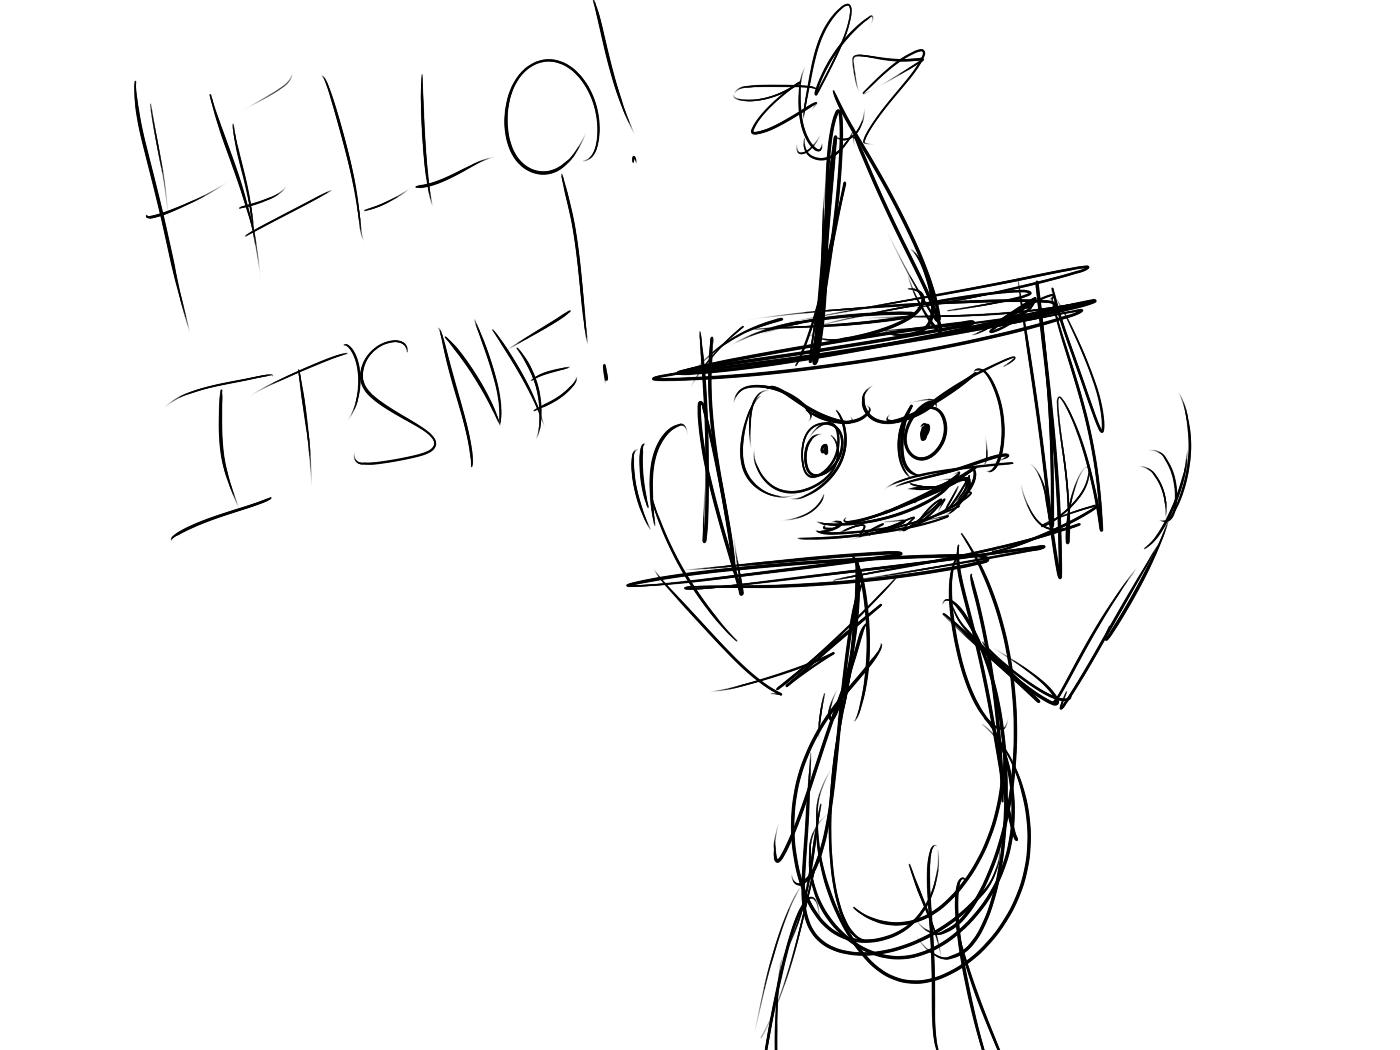 HELLO! IT'S ME! by Serri765